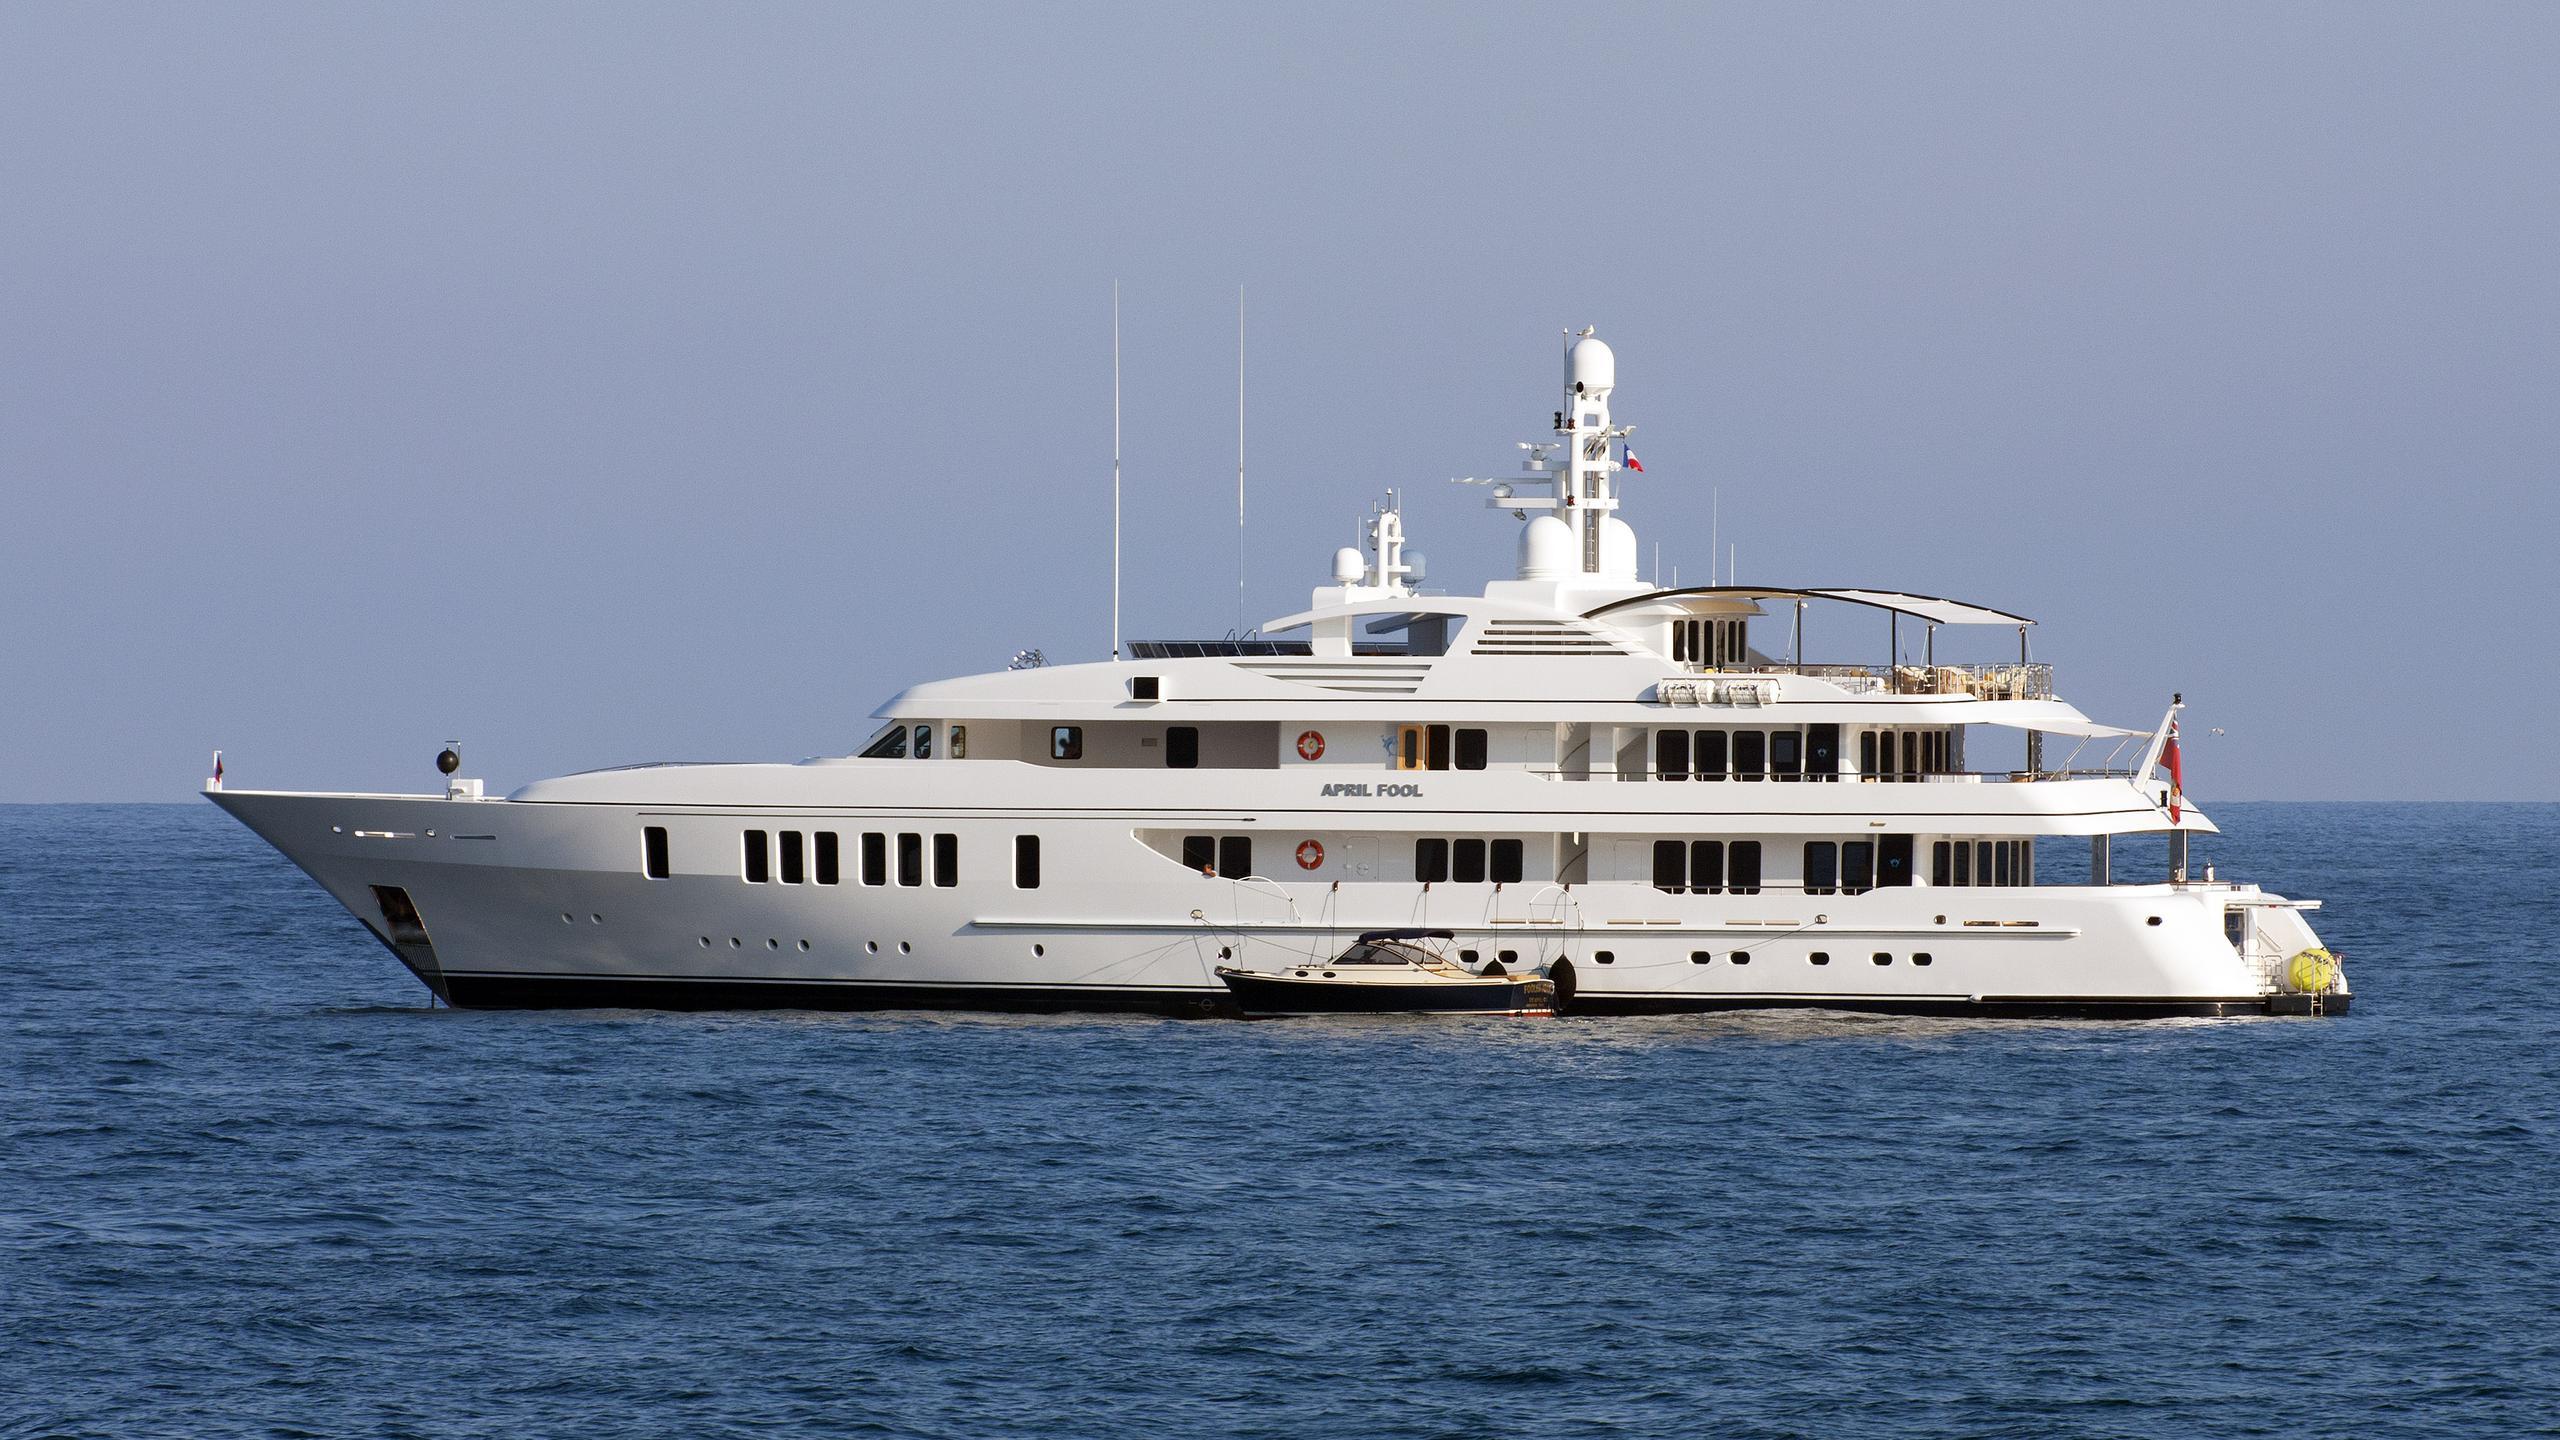 samadhi-motor-yacht-feadship-2006-61m-profile